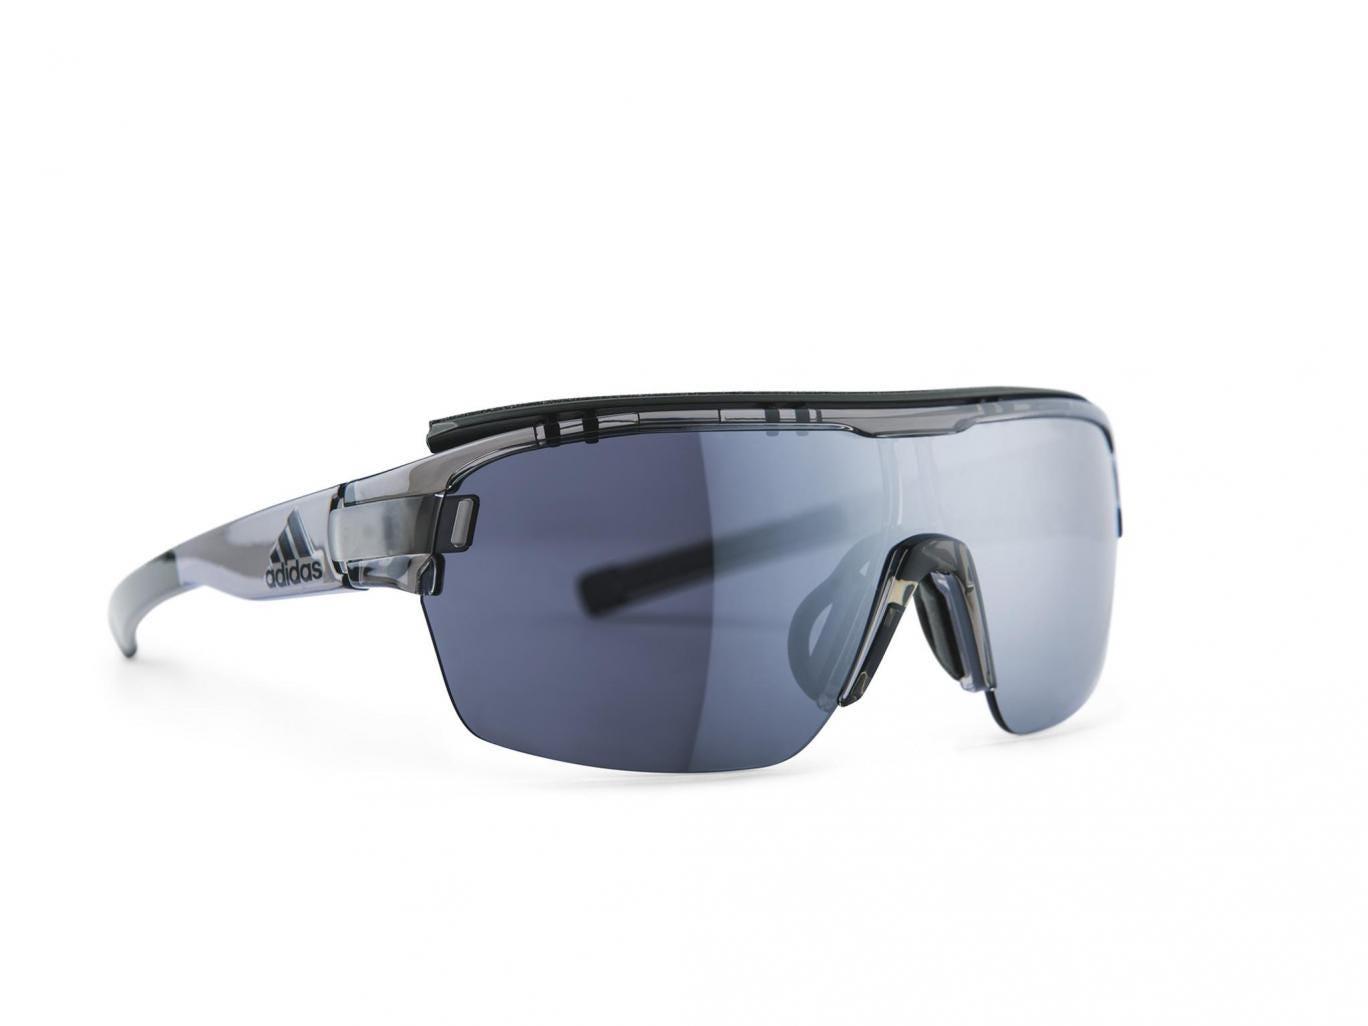 Smith Sunglasses Sunglasses RxSport